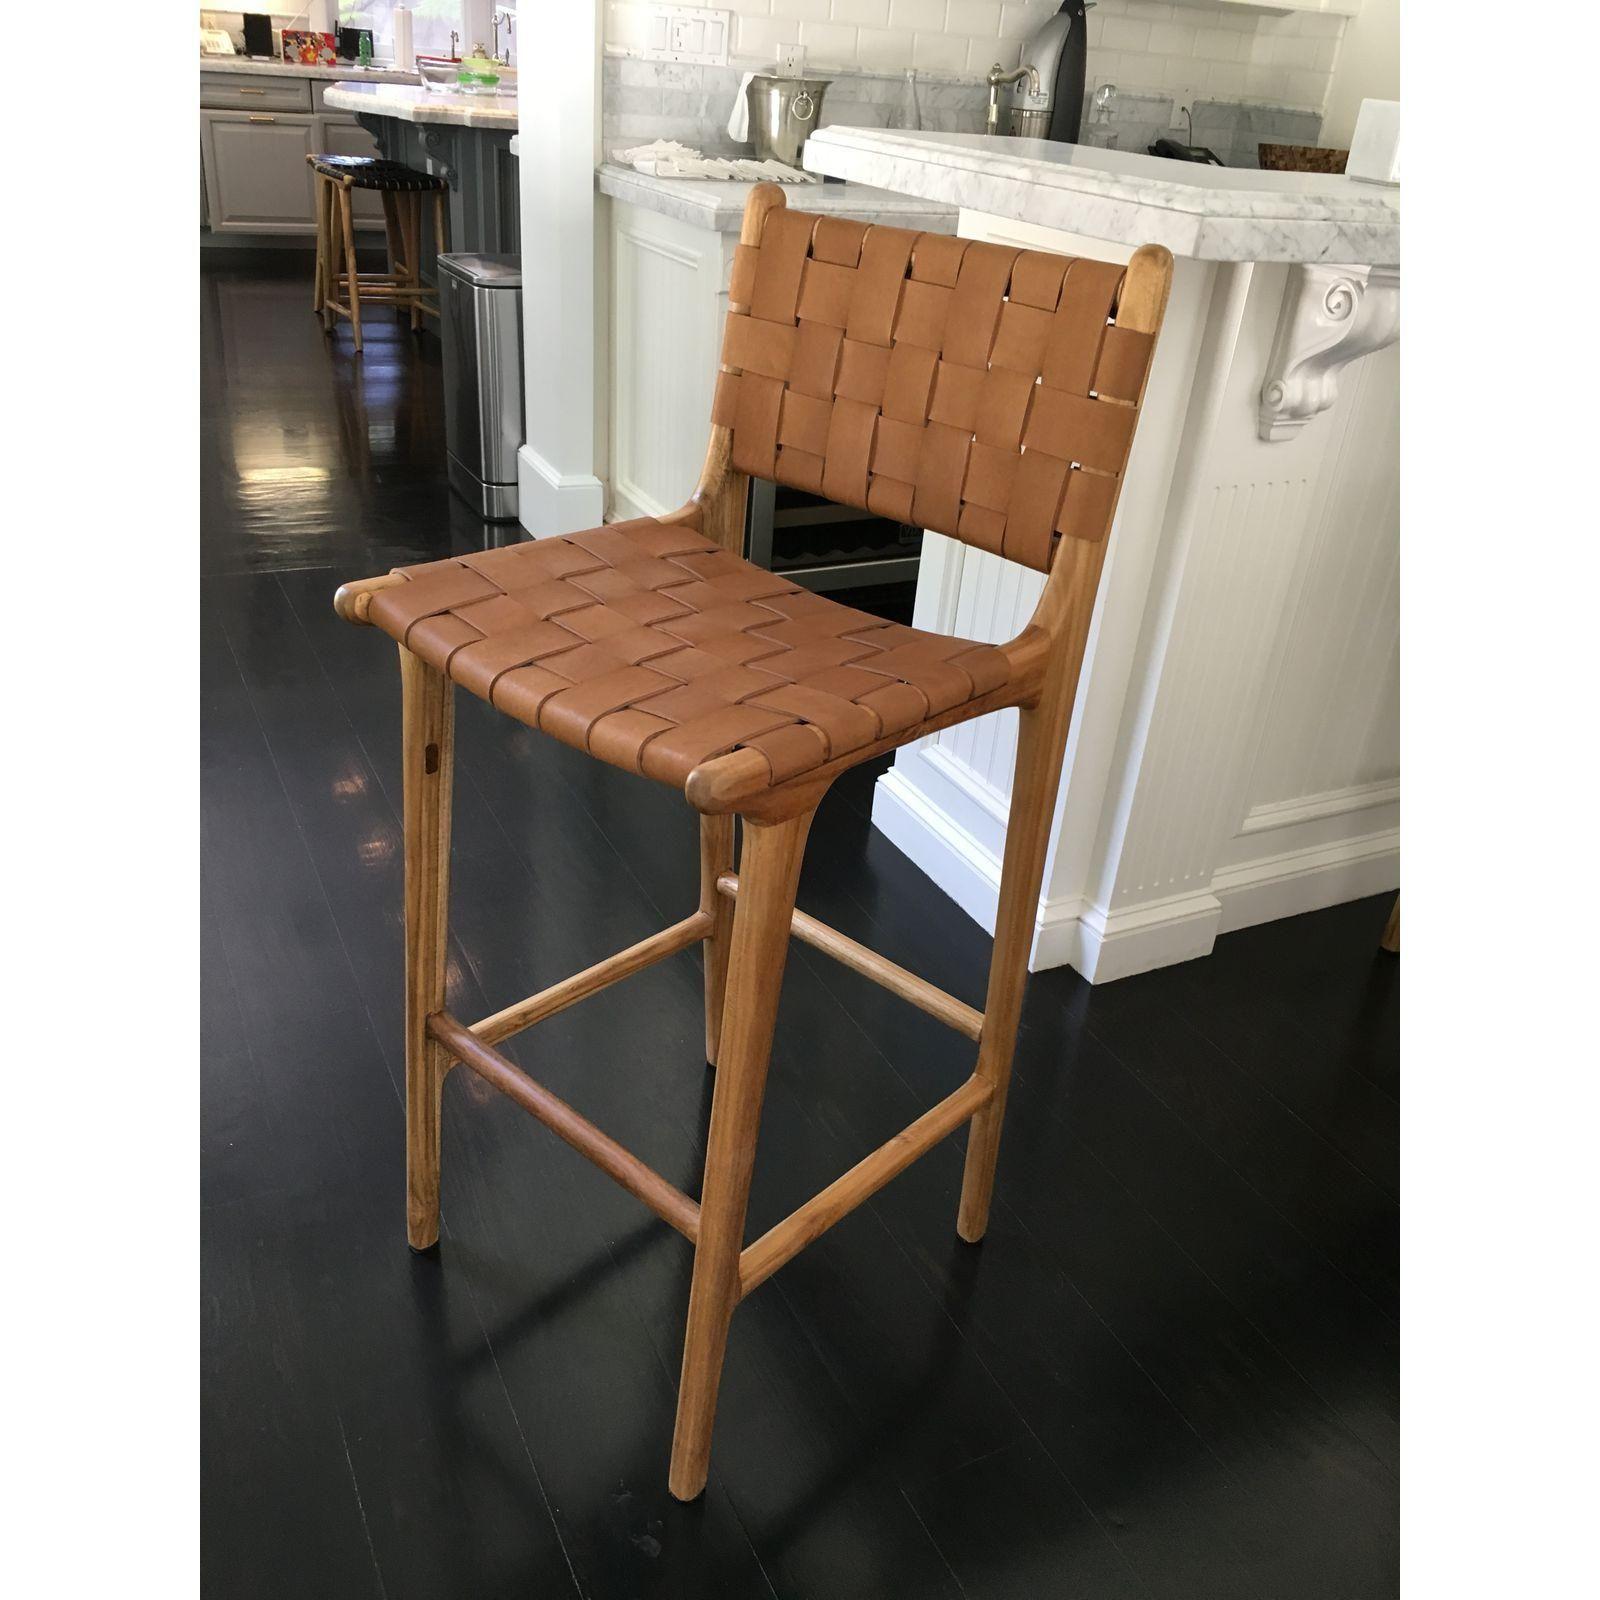 Astounding Saffron Poe Woven Leather Strap Counter Stool In 2019 Creativecarmelina Interior Chair Design Creativecarmelinacom